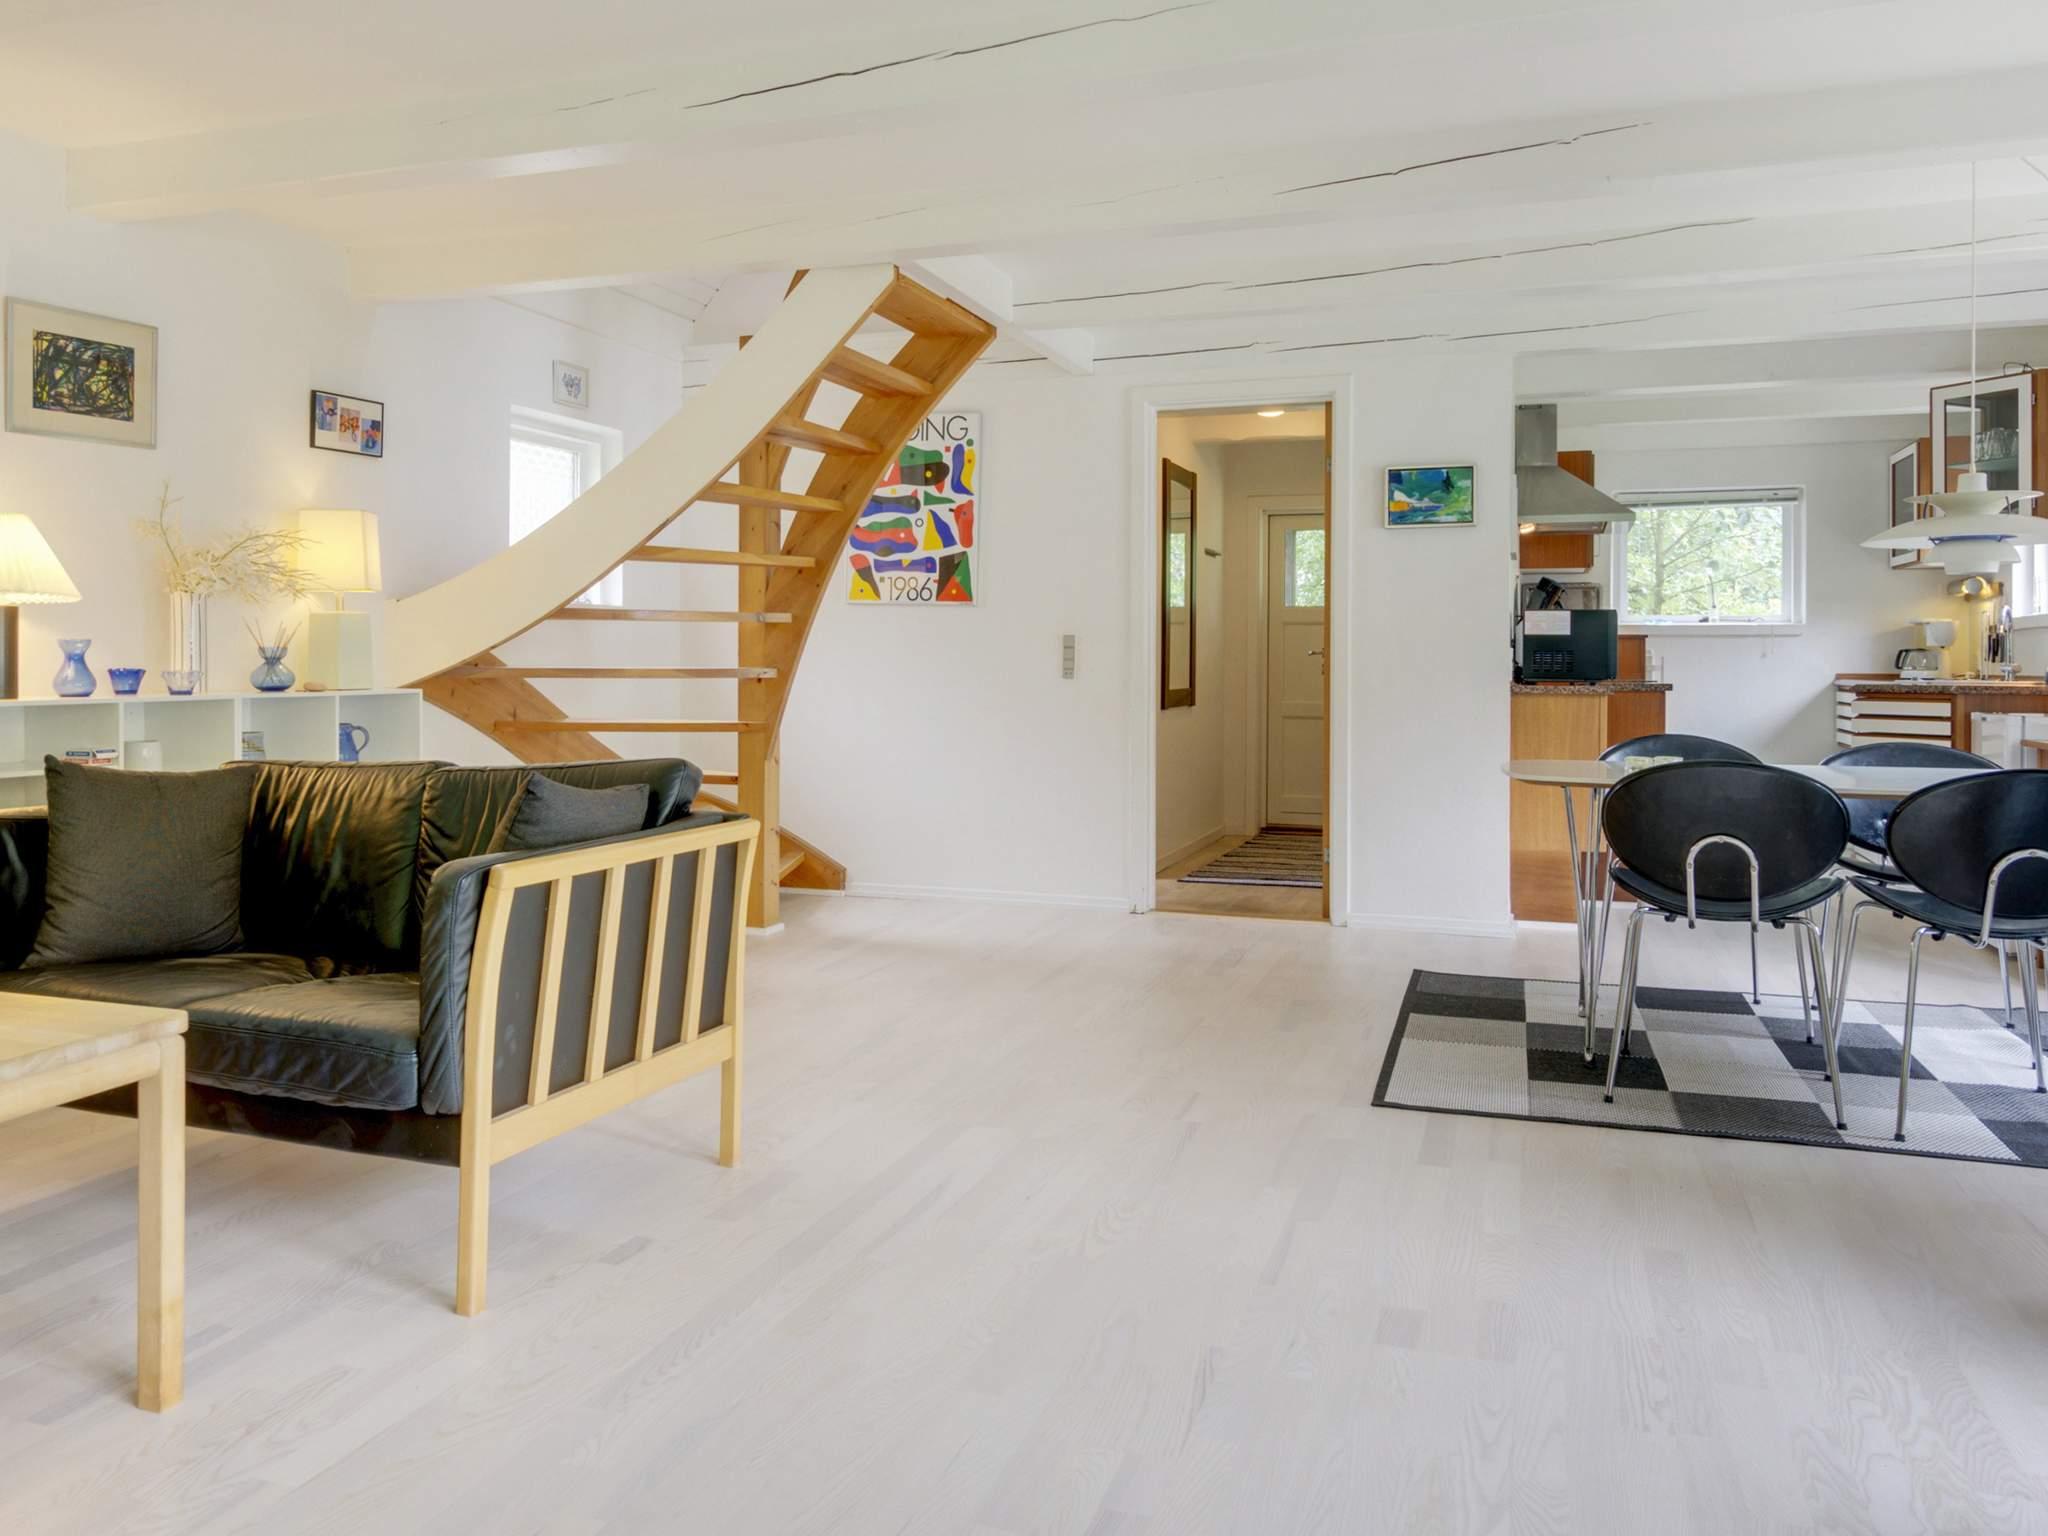 Ferienhaus Balka Strand (660138), Balke, , Bornholm, Dänemark, Bild 2